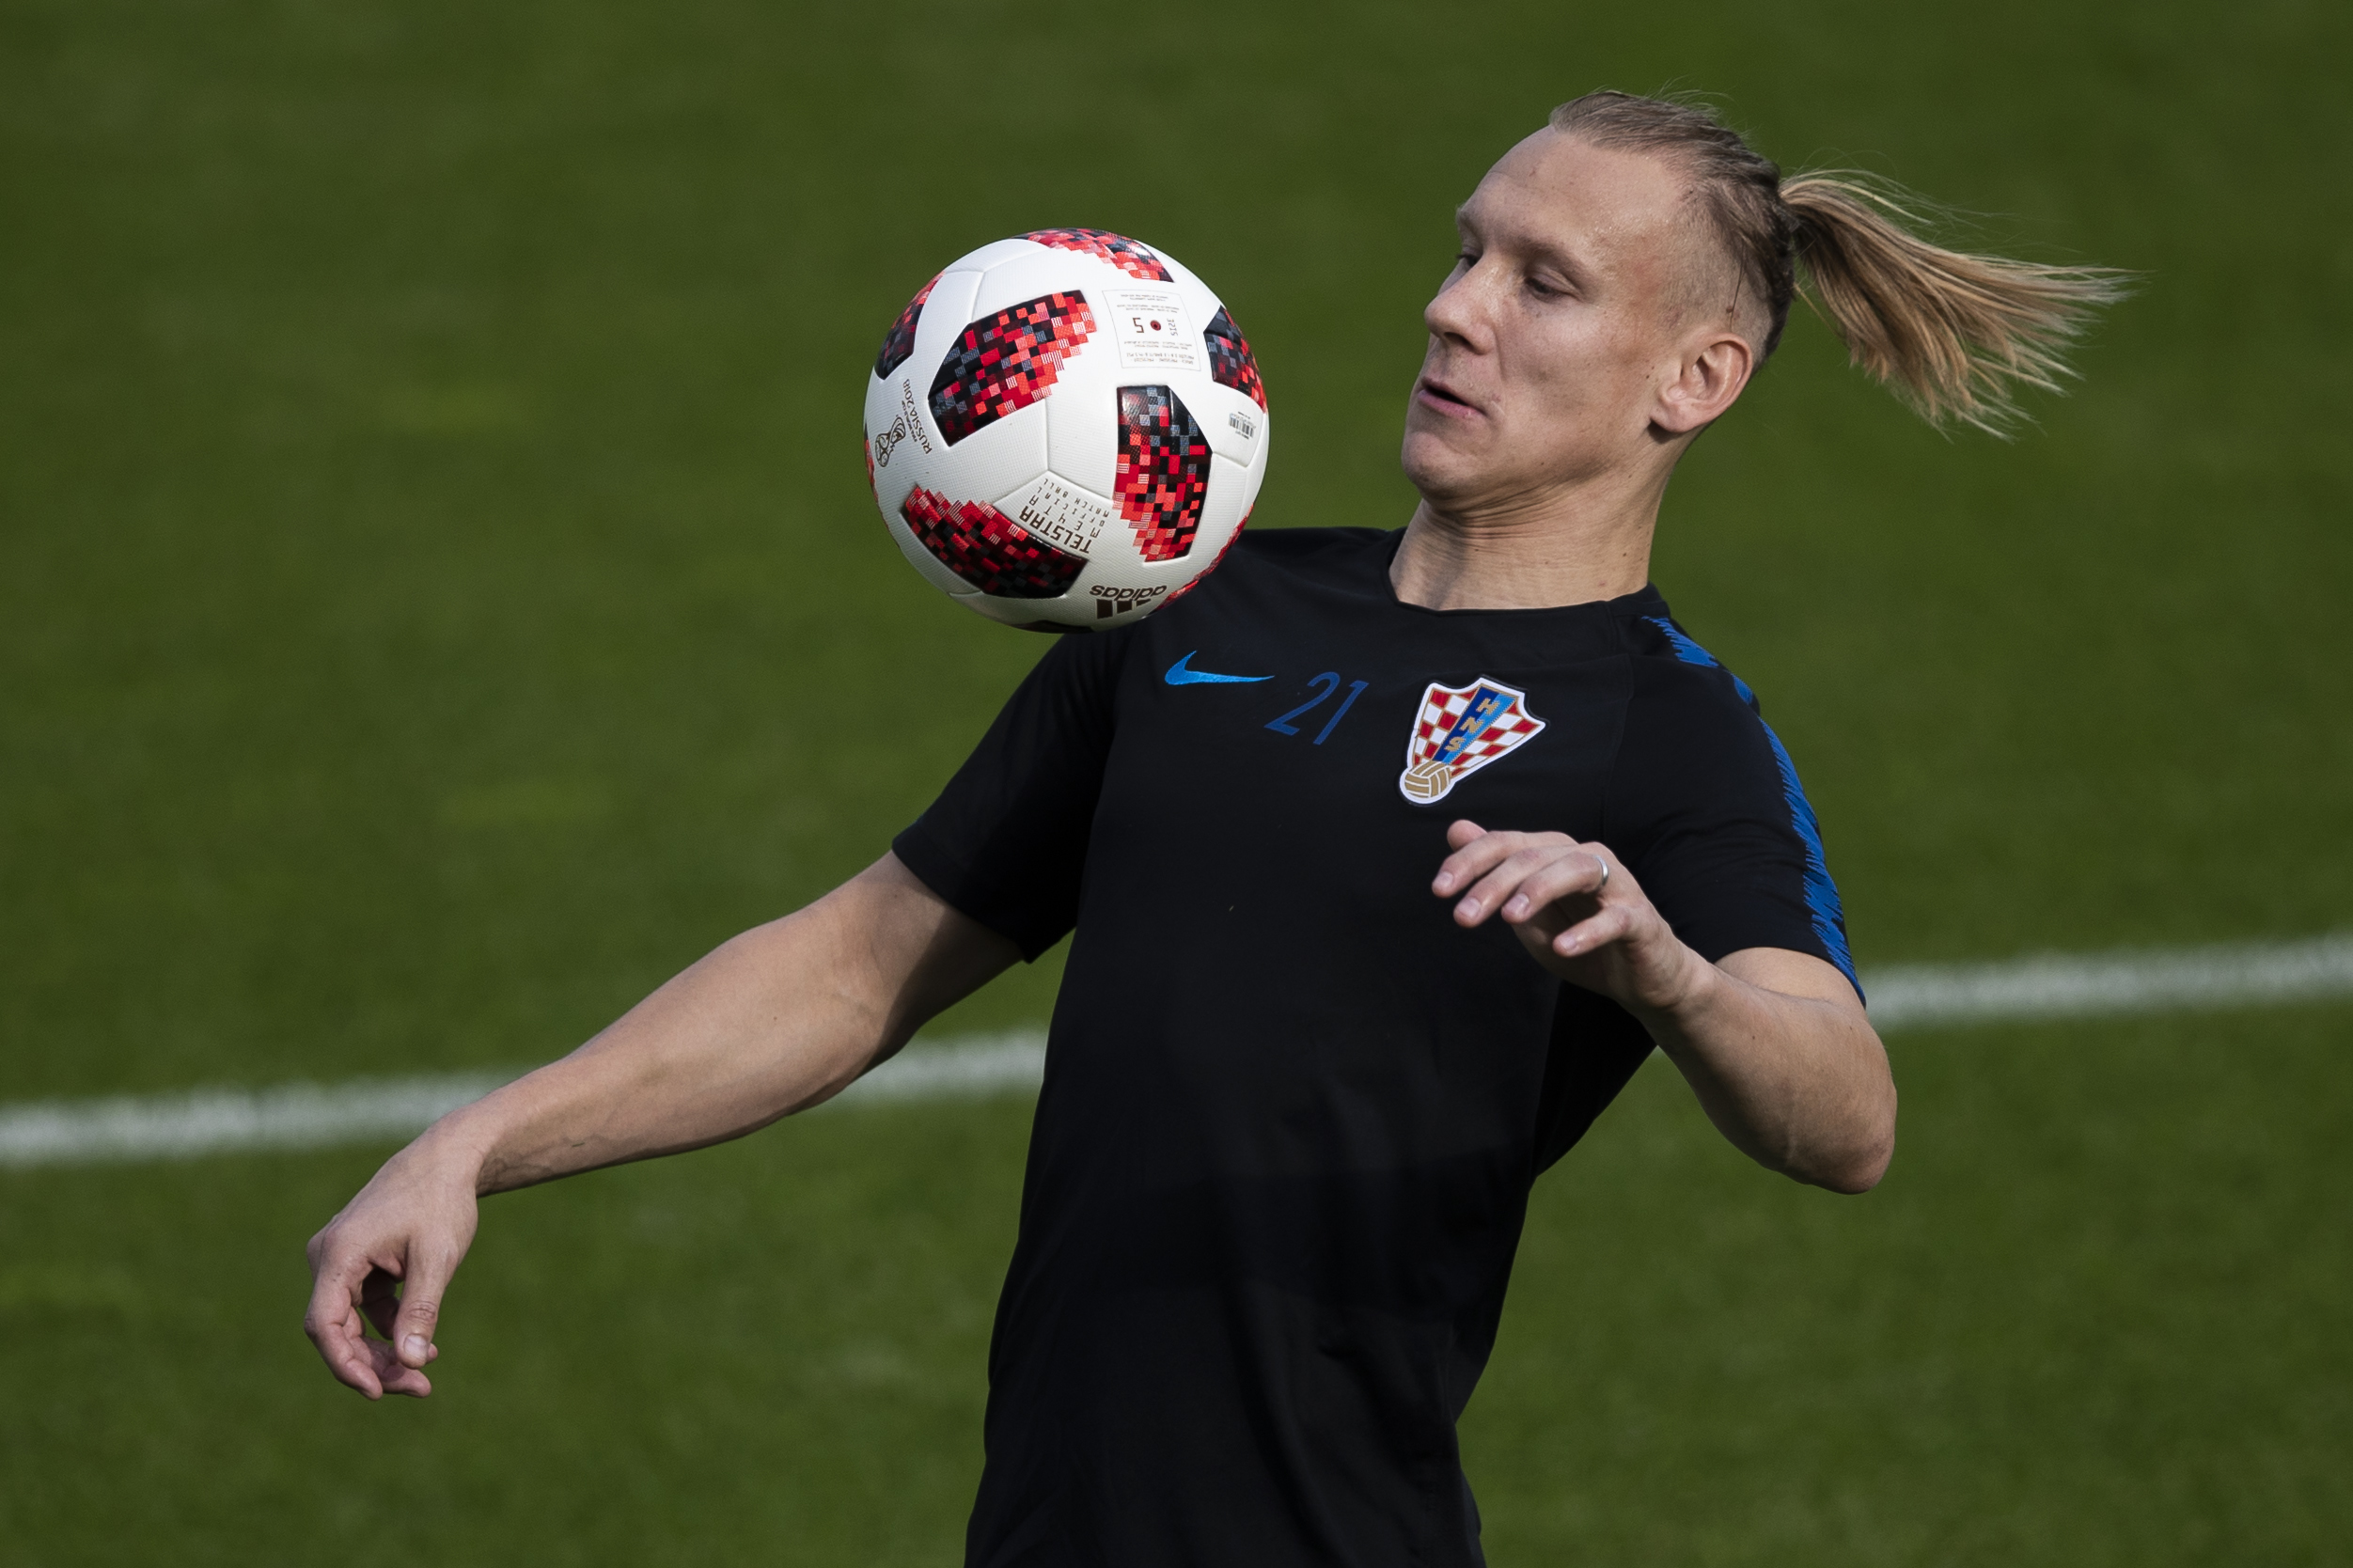 Croatia's Domagoj Vida trains with the Adidas ball (AP Photo/Francisco Seco)